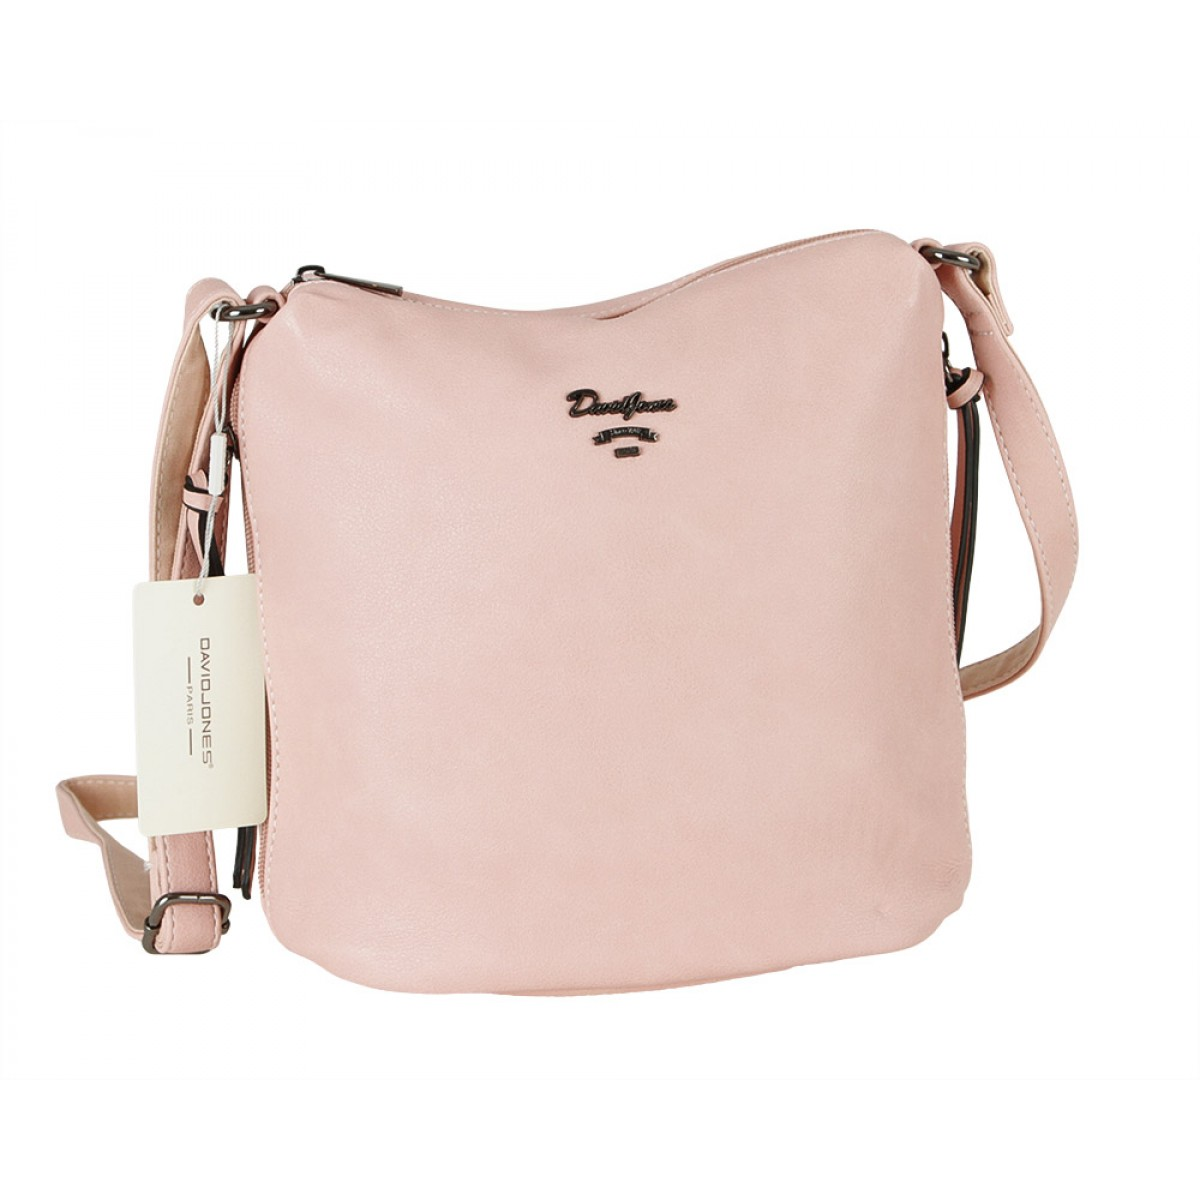 Жіноча сумка David Jones 6202-1A PINK